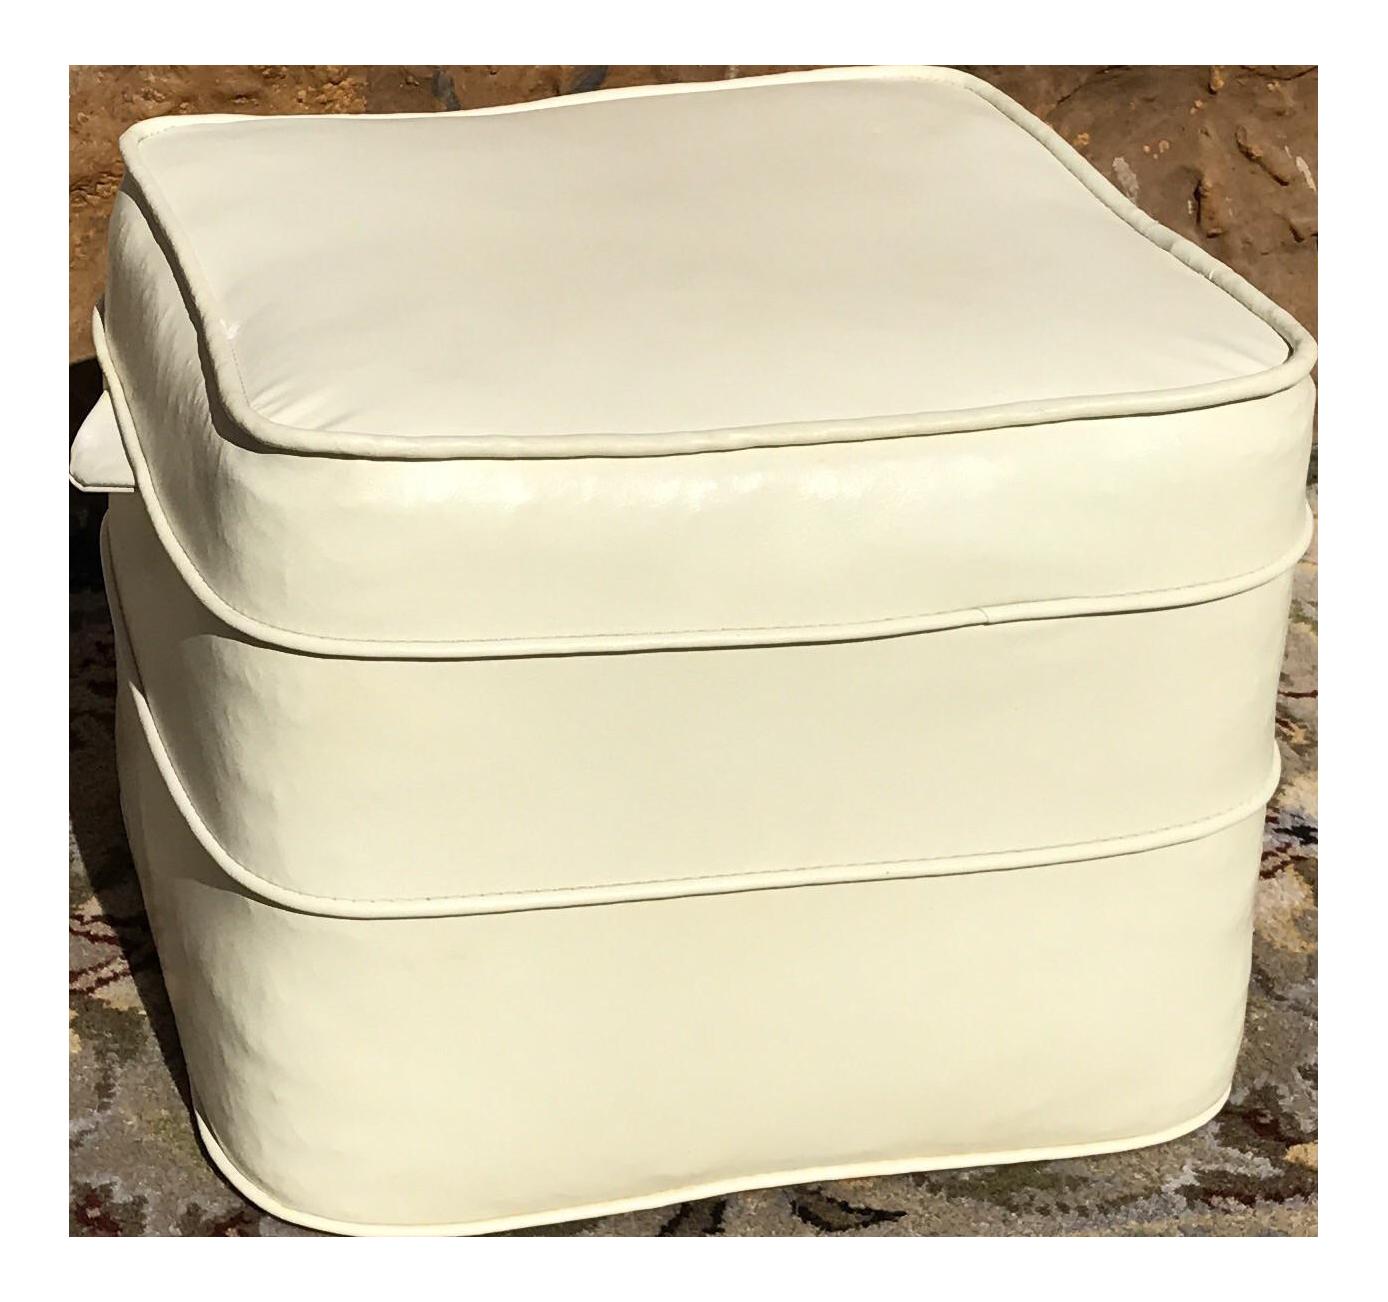 Mid century hassock cream footstool chairish for Small storage hassocks